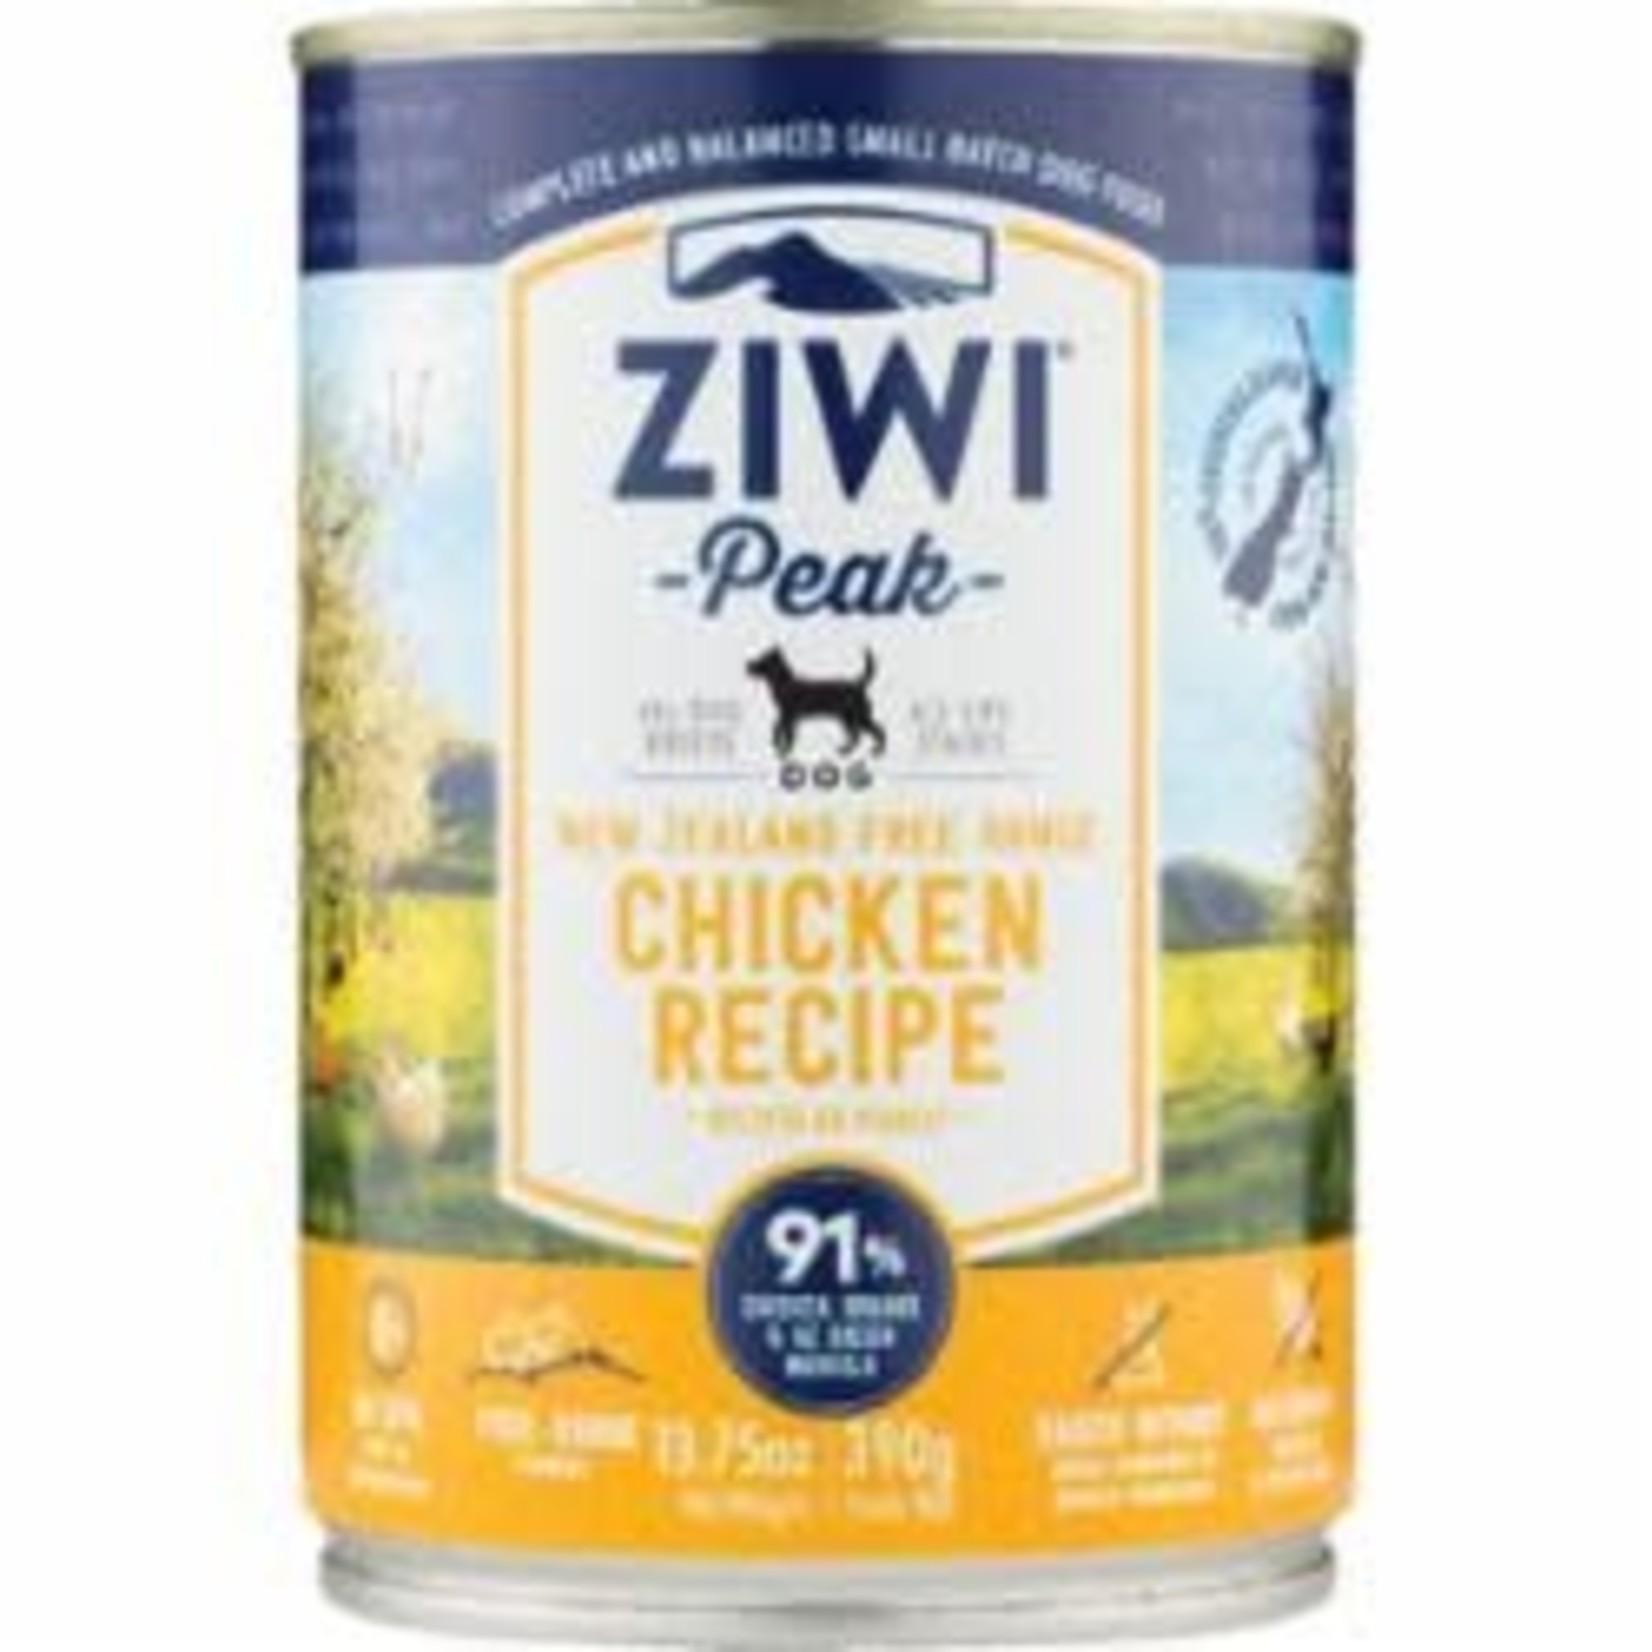 Ziwi Peak Ziwi Dog Grain Free Chicken 13.75 OZ